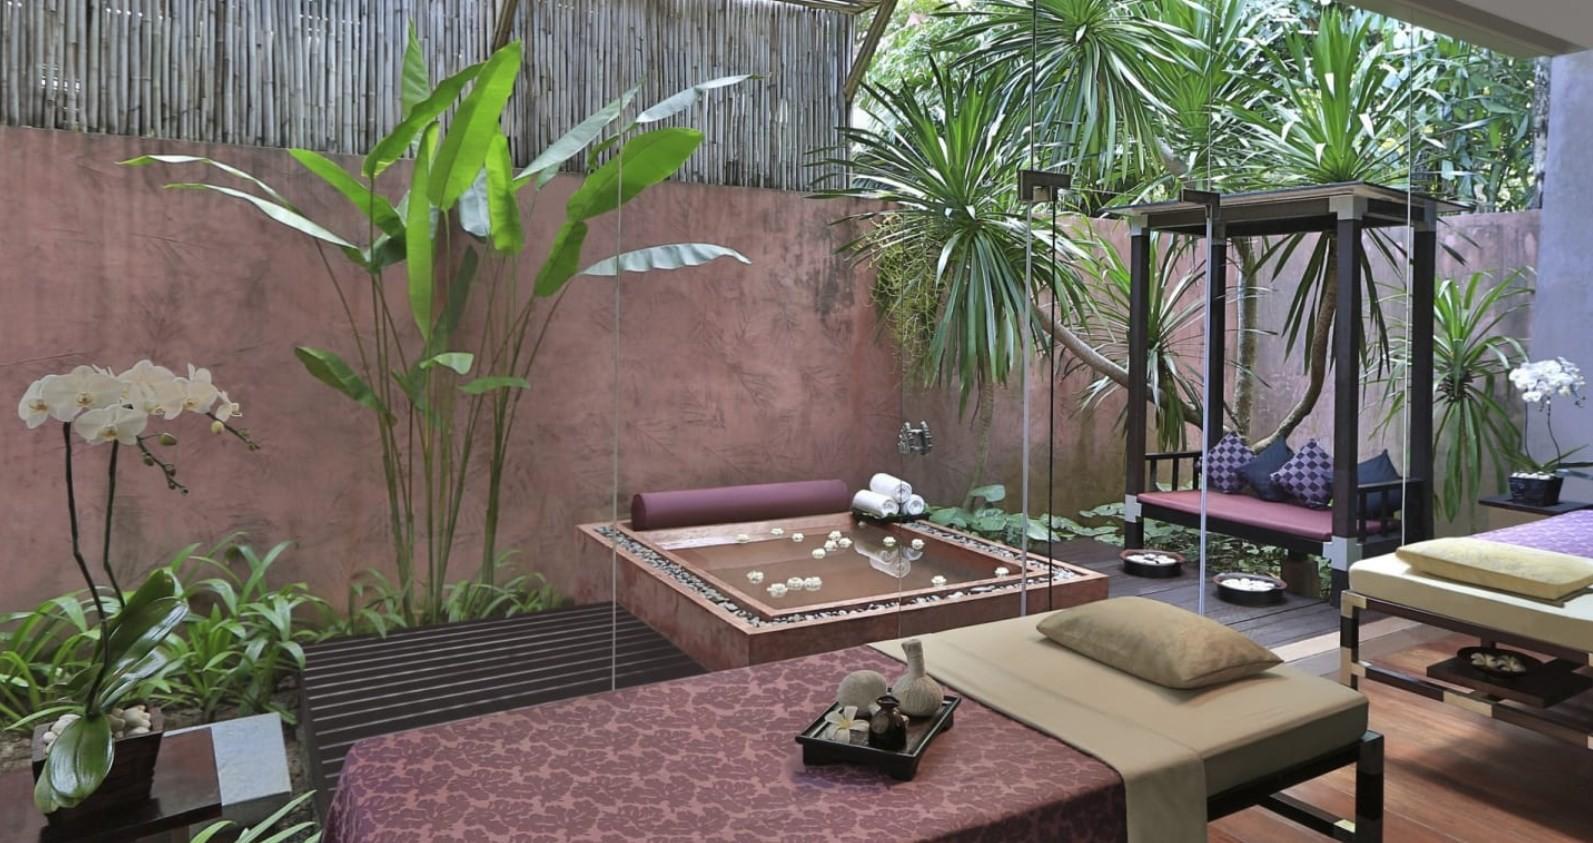 news-main-anantara-welcomes-back-international-guests-to-thailands-famous-islands-of-koh-samui-and-koh-phangan.1626544235.jpg